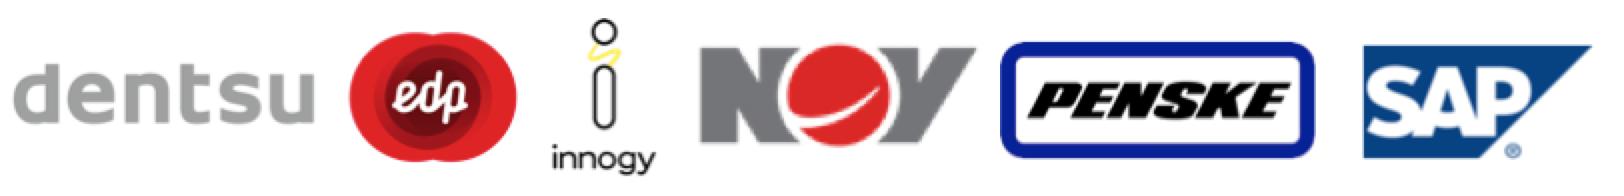 Brands 2019 logos.png